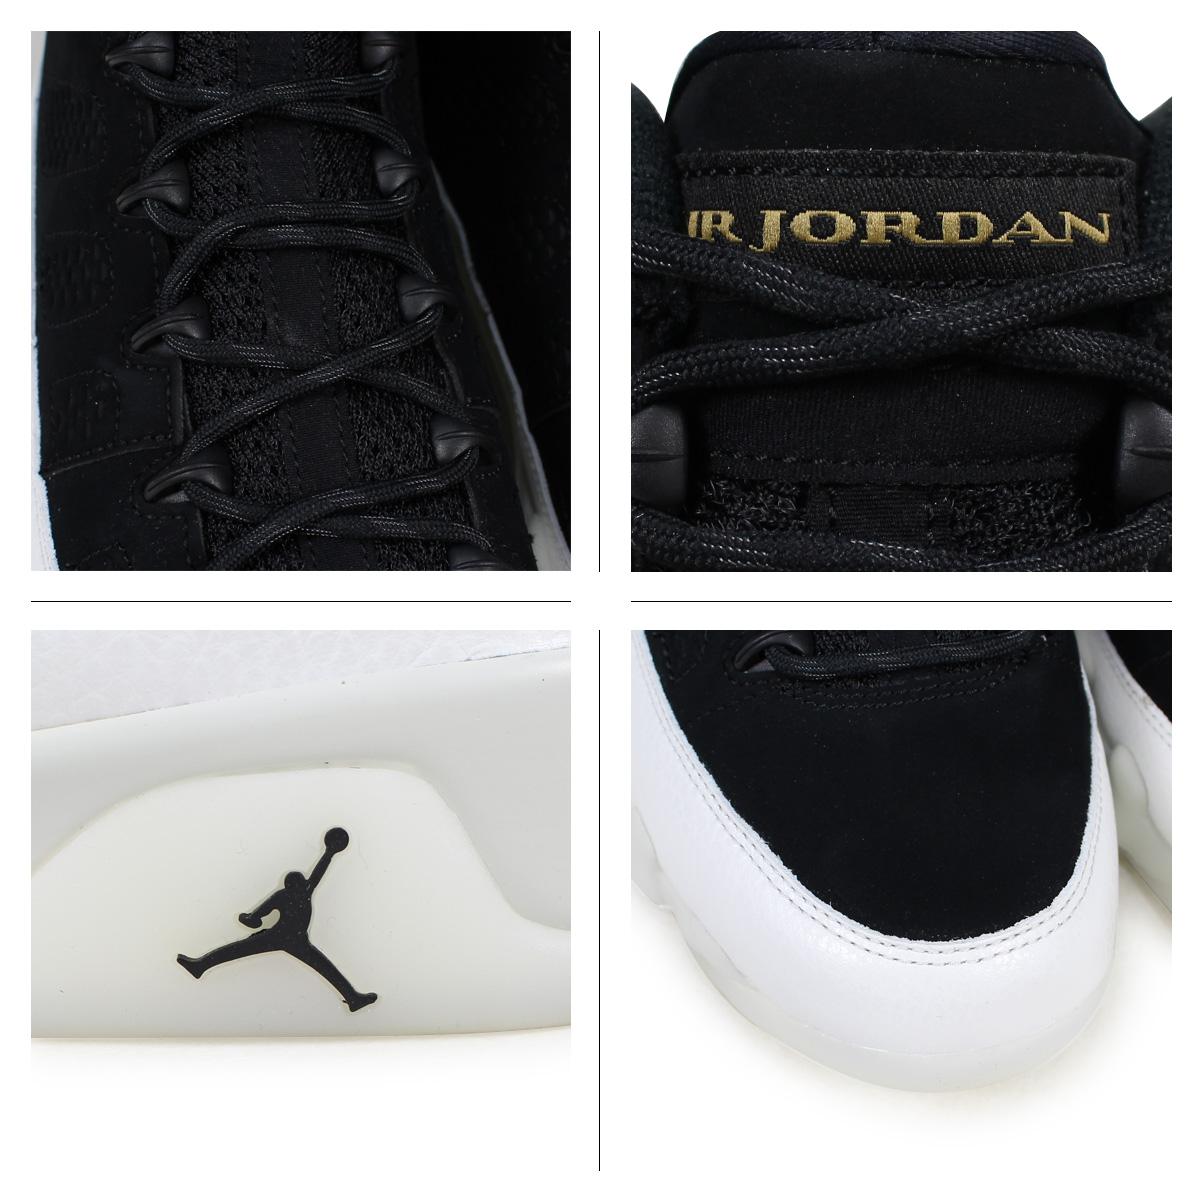 c44e6c6f7c0 ... NIKE AIR JORDAN 9 RETRO CITY OF FLIGHT Nike Air Jordan 9 nostalgic  sneakers men 302,370 ...